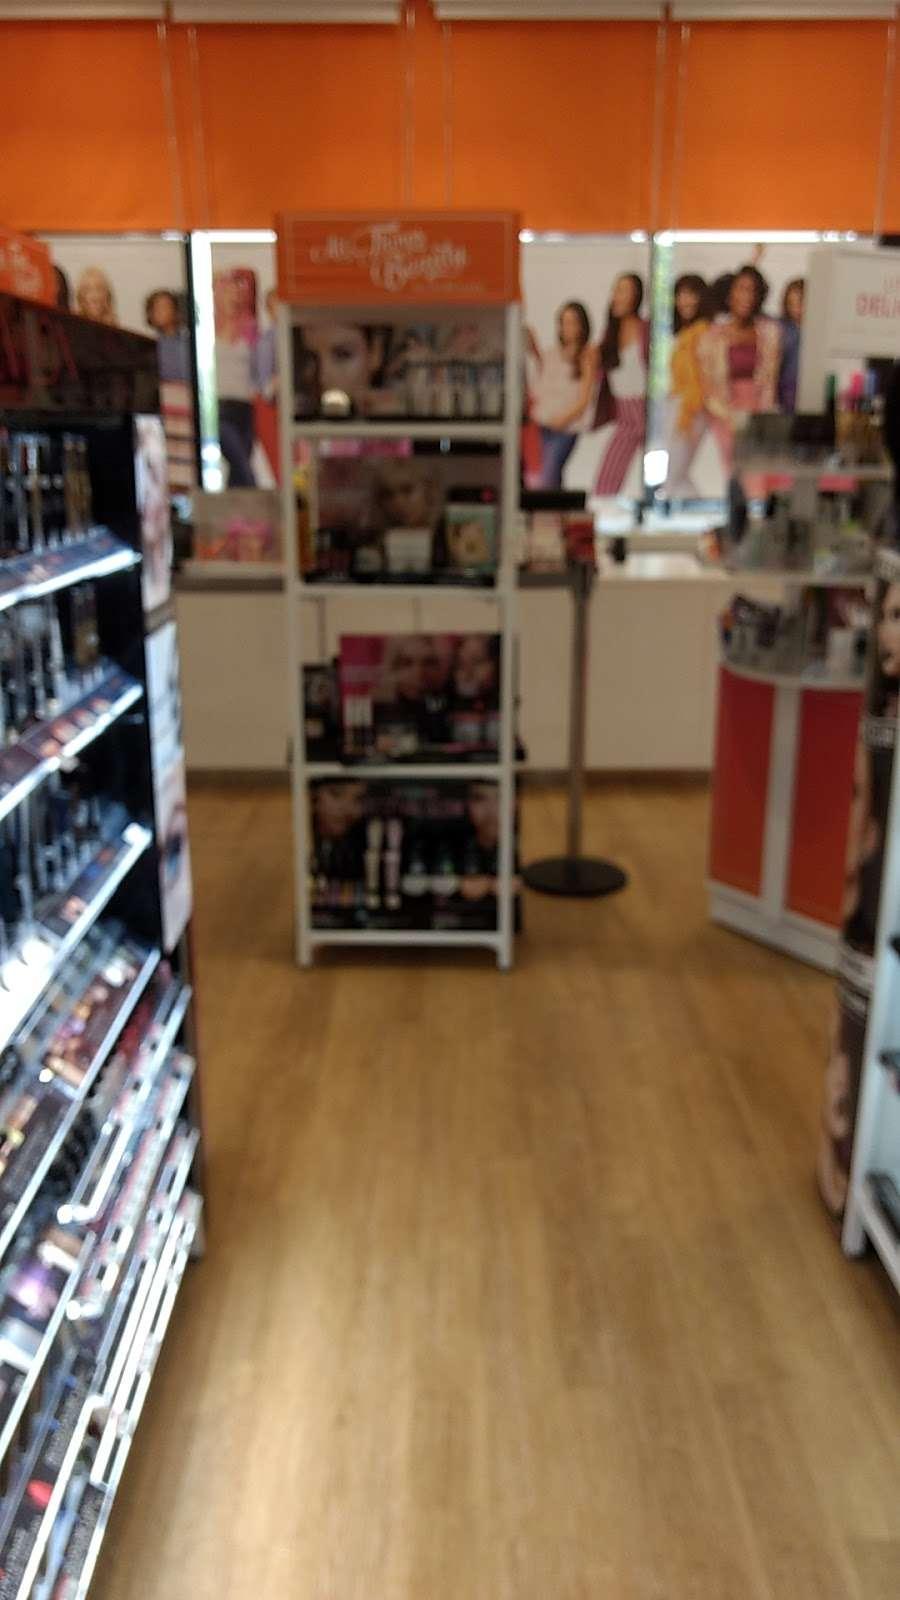 Ulta Beauty Hair Care 32 Farm View Montvale Nj 07645 Usa